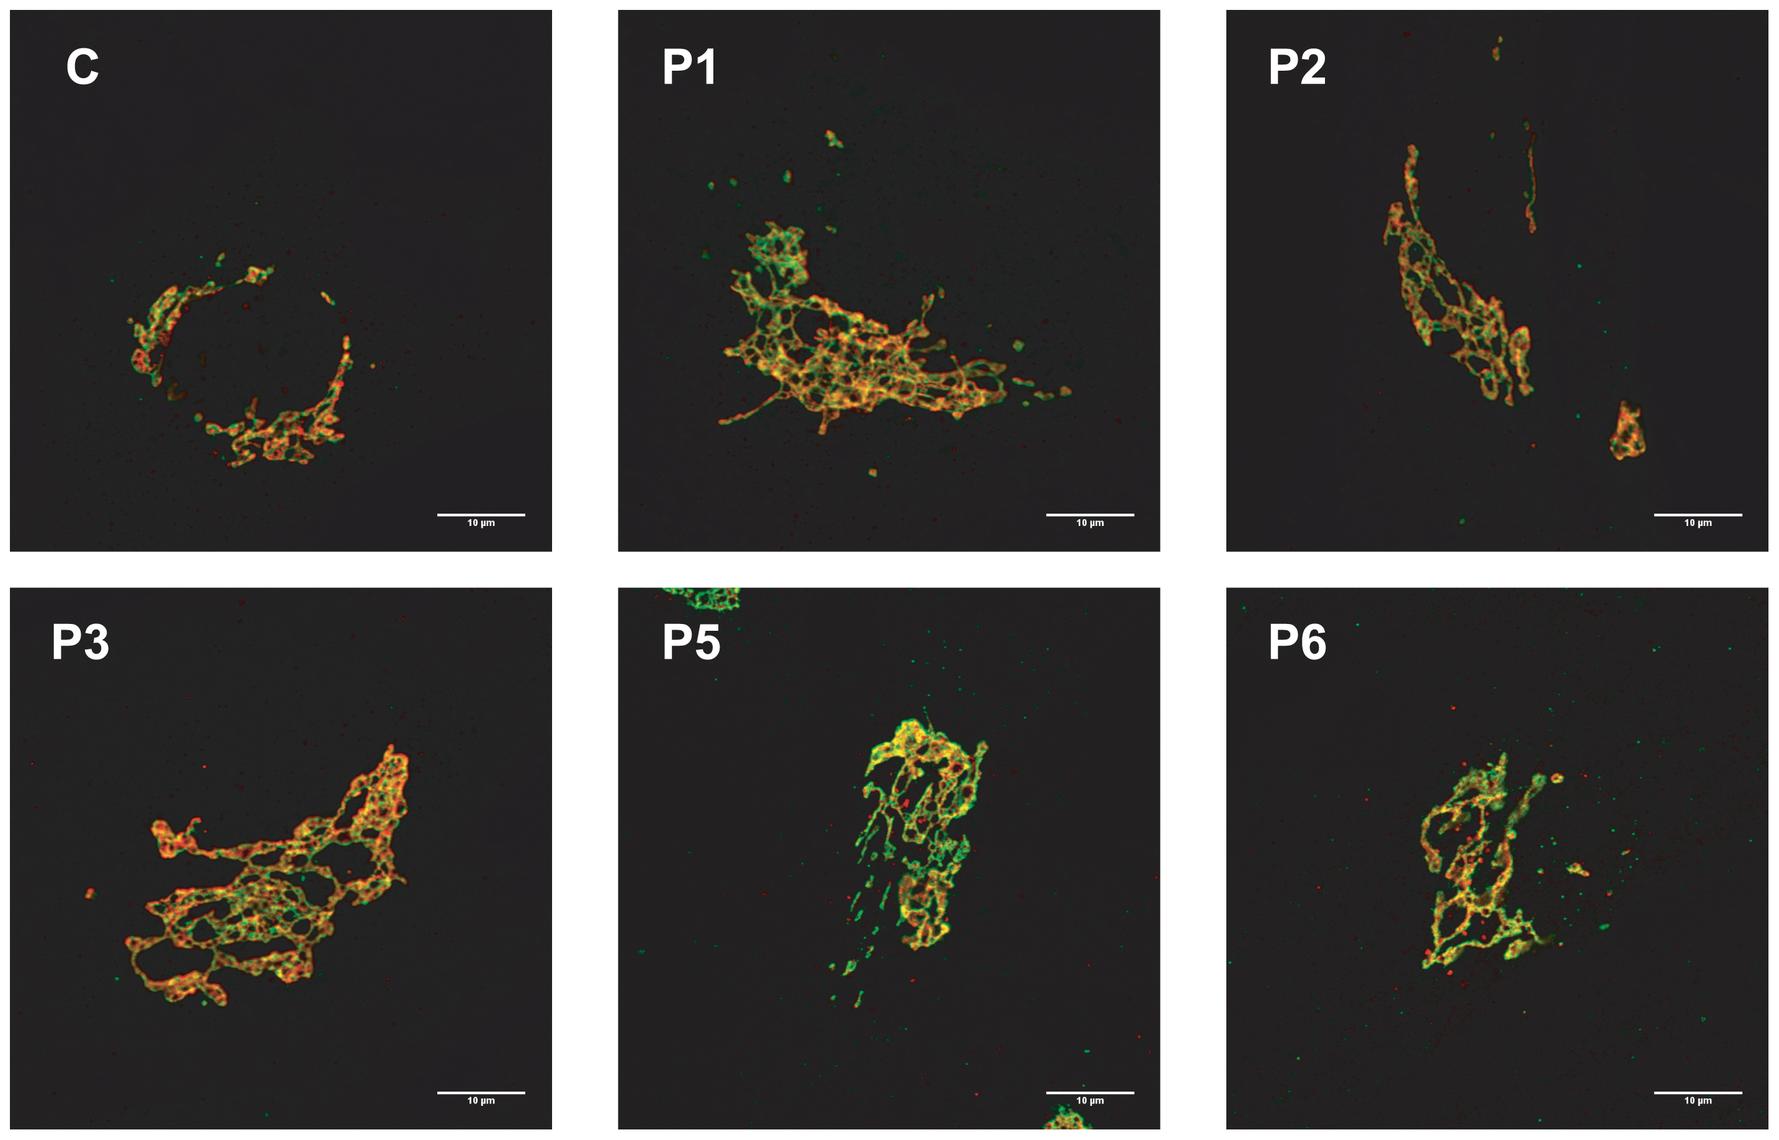 MAN1B1-deficient fibroblasts present alterations in Golgi structure.